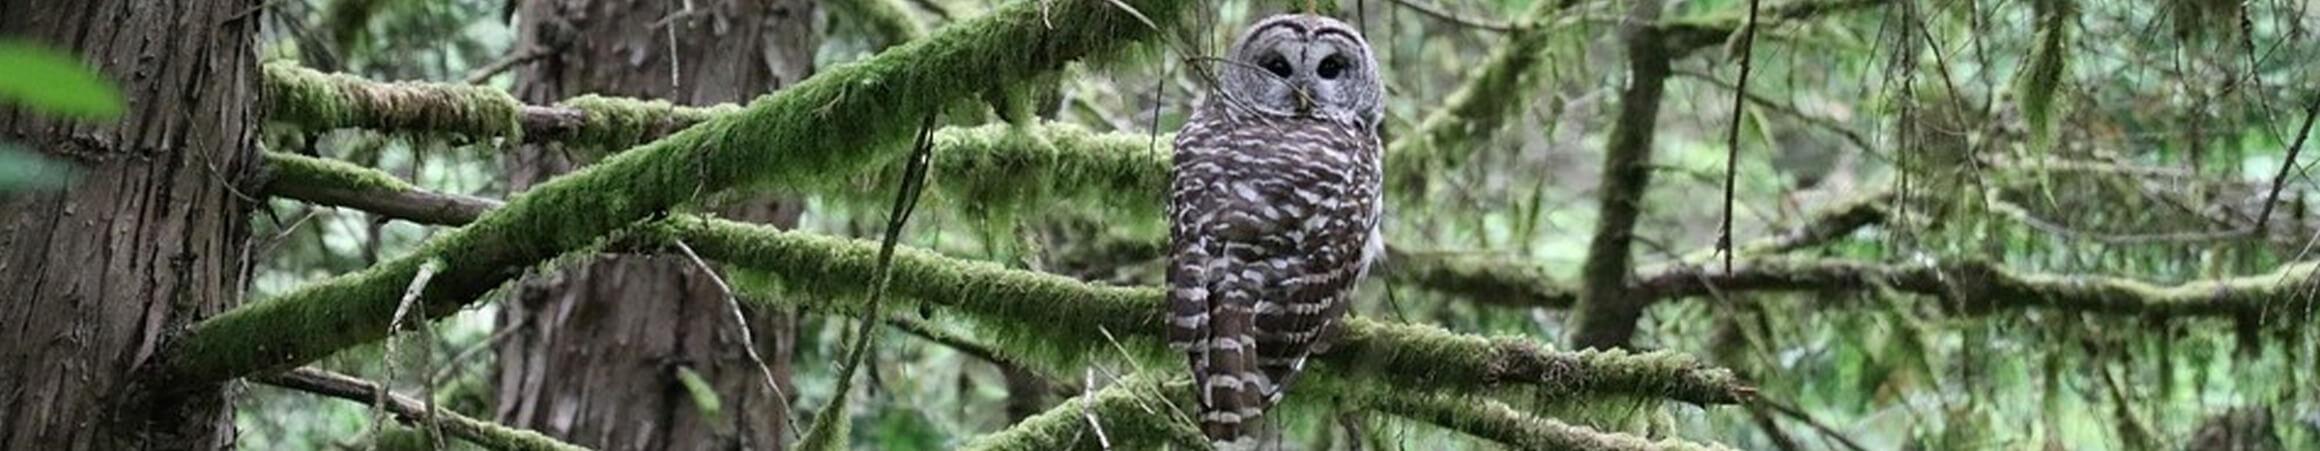 Owl0custom